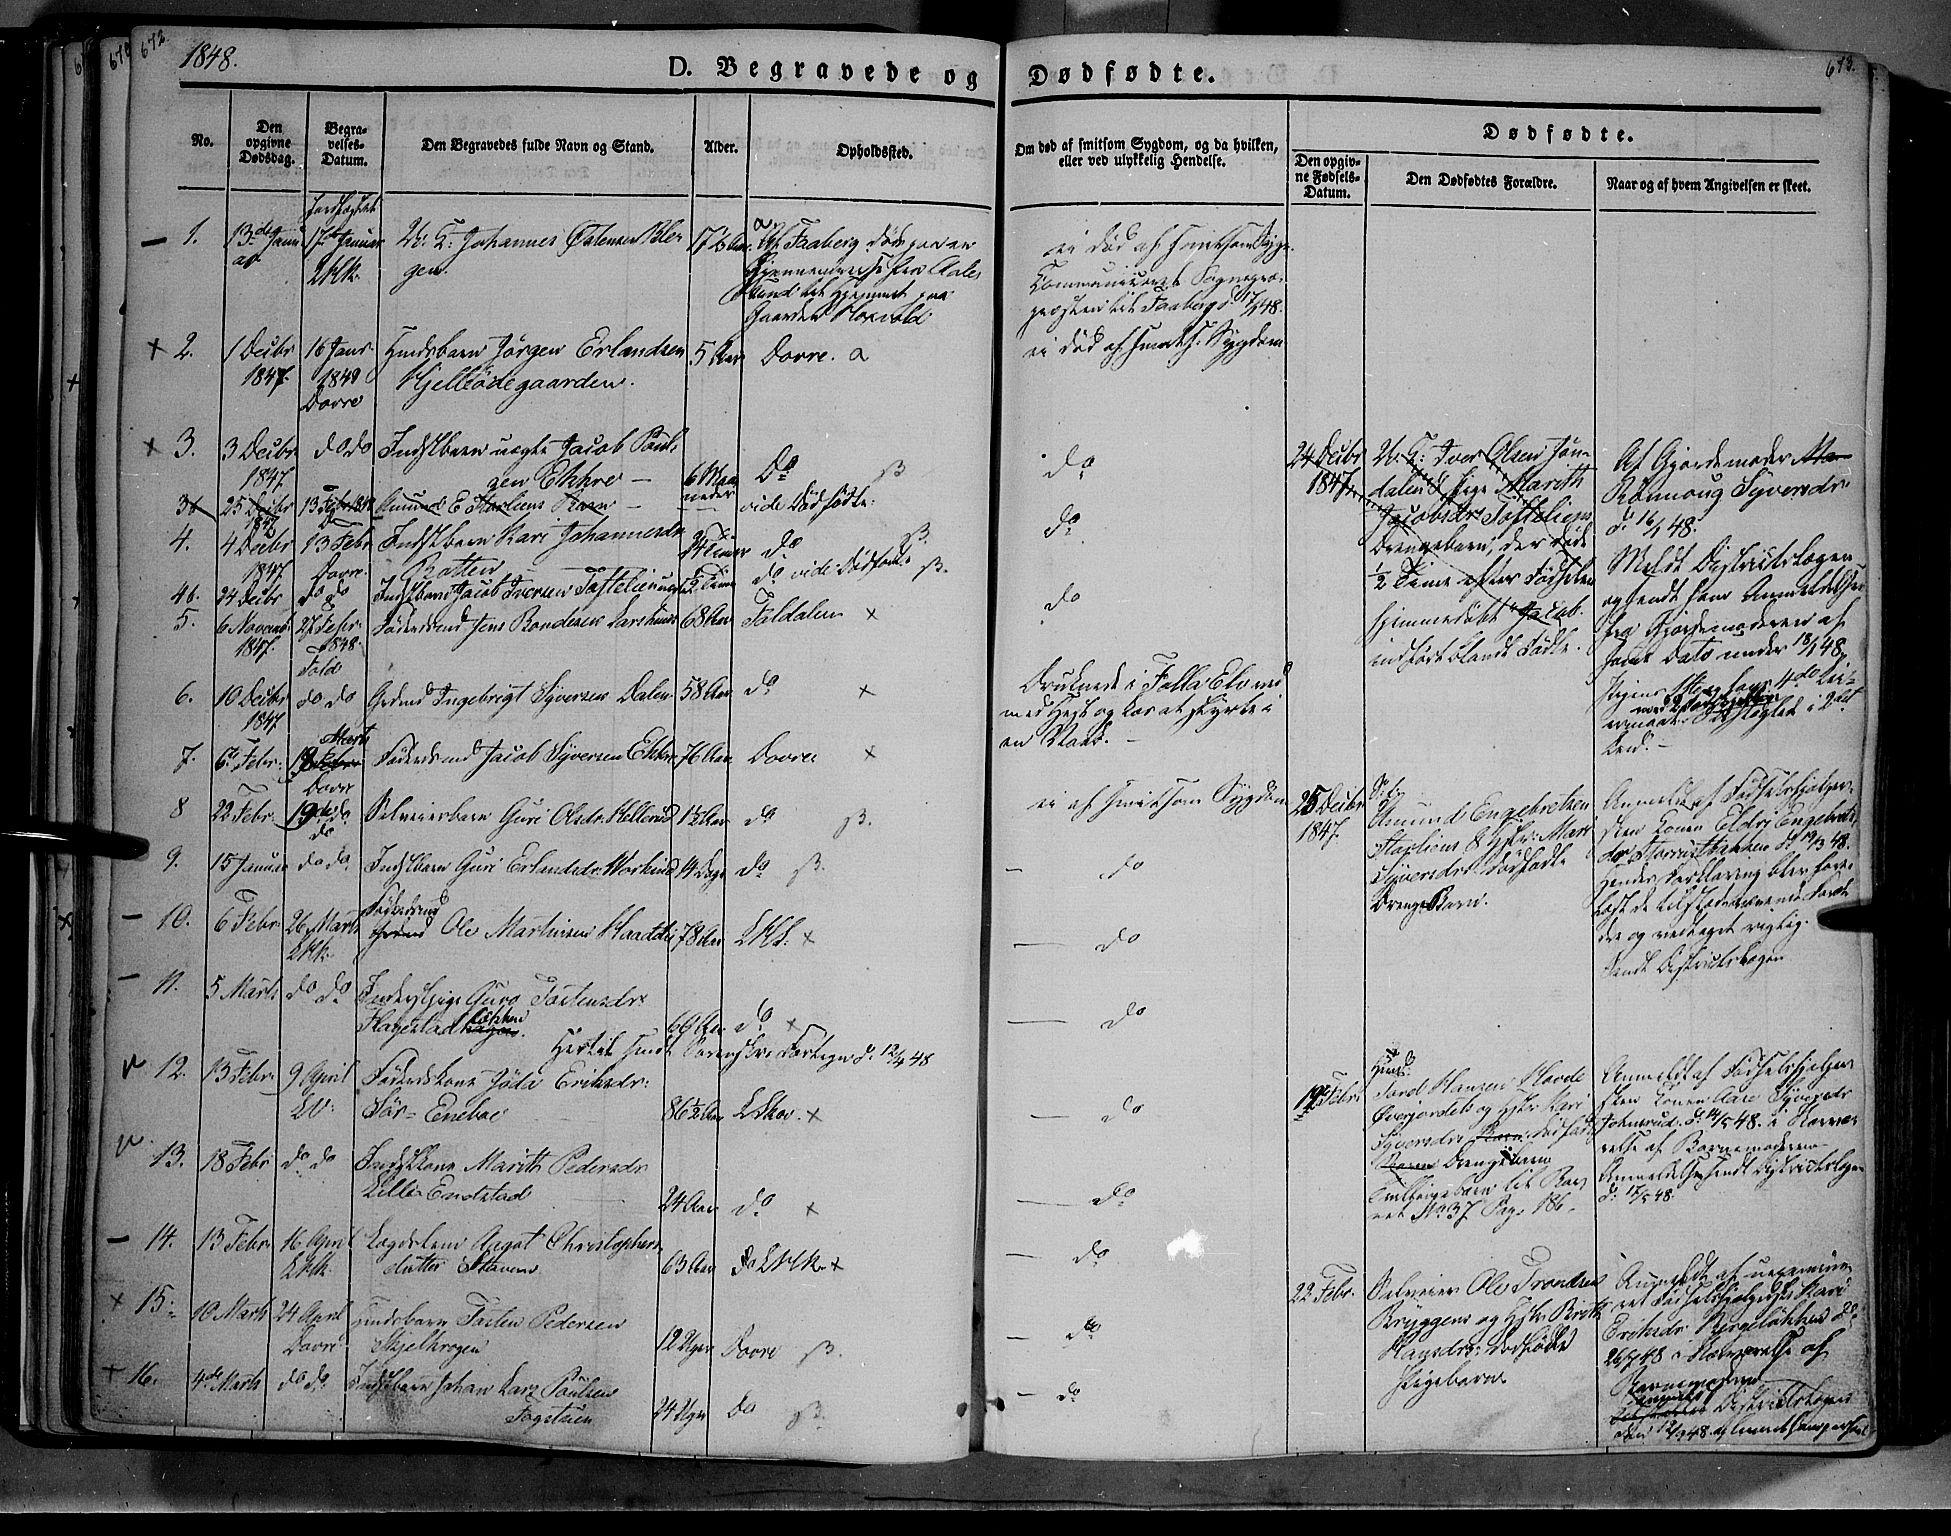 SAH, Lesja prestekontor, Ministerialbok nr. 6B, 1843-1854, s. 672-673